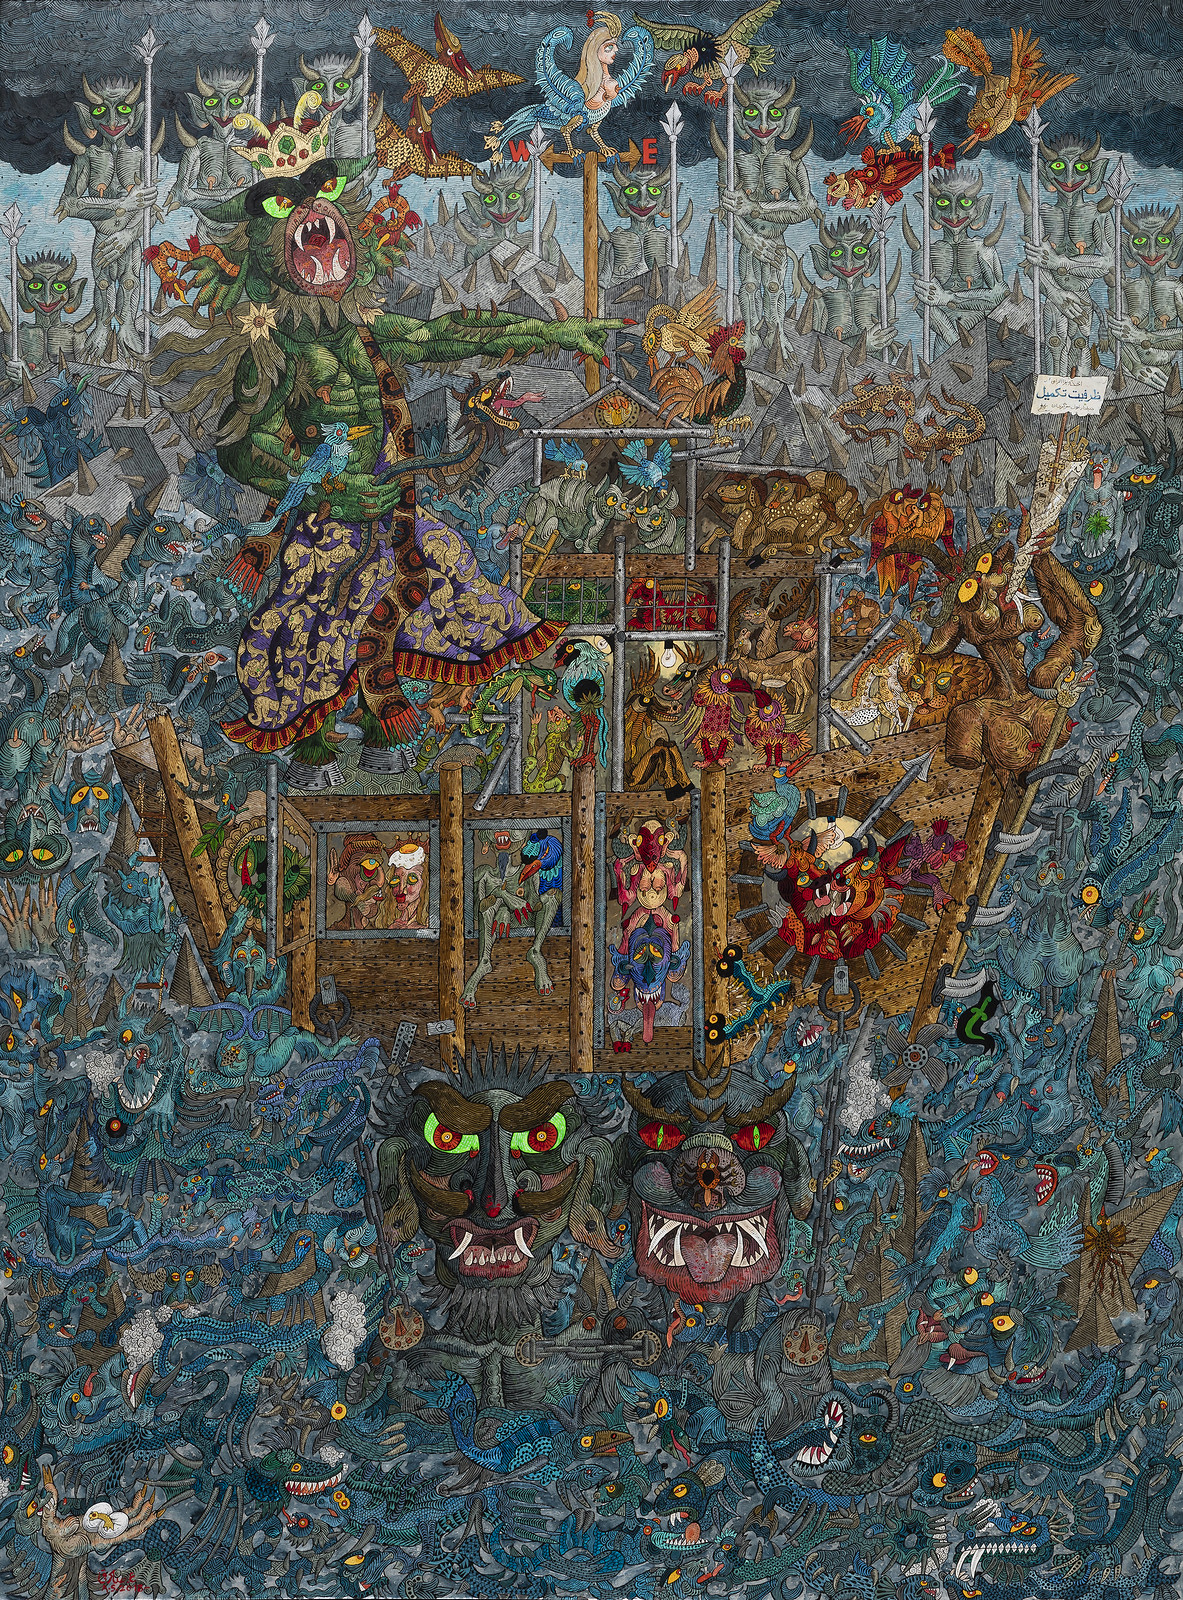 Ali Akbar Sadeghi - As Demon Noah